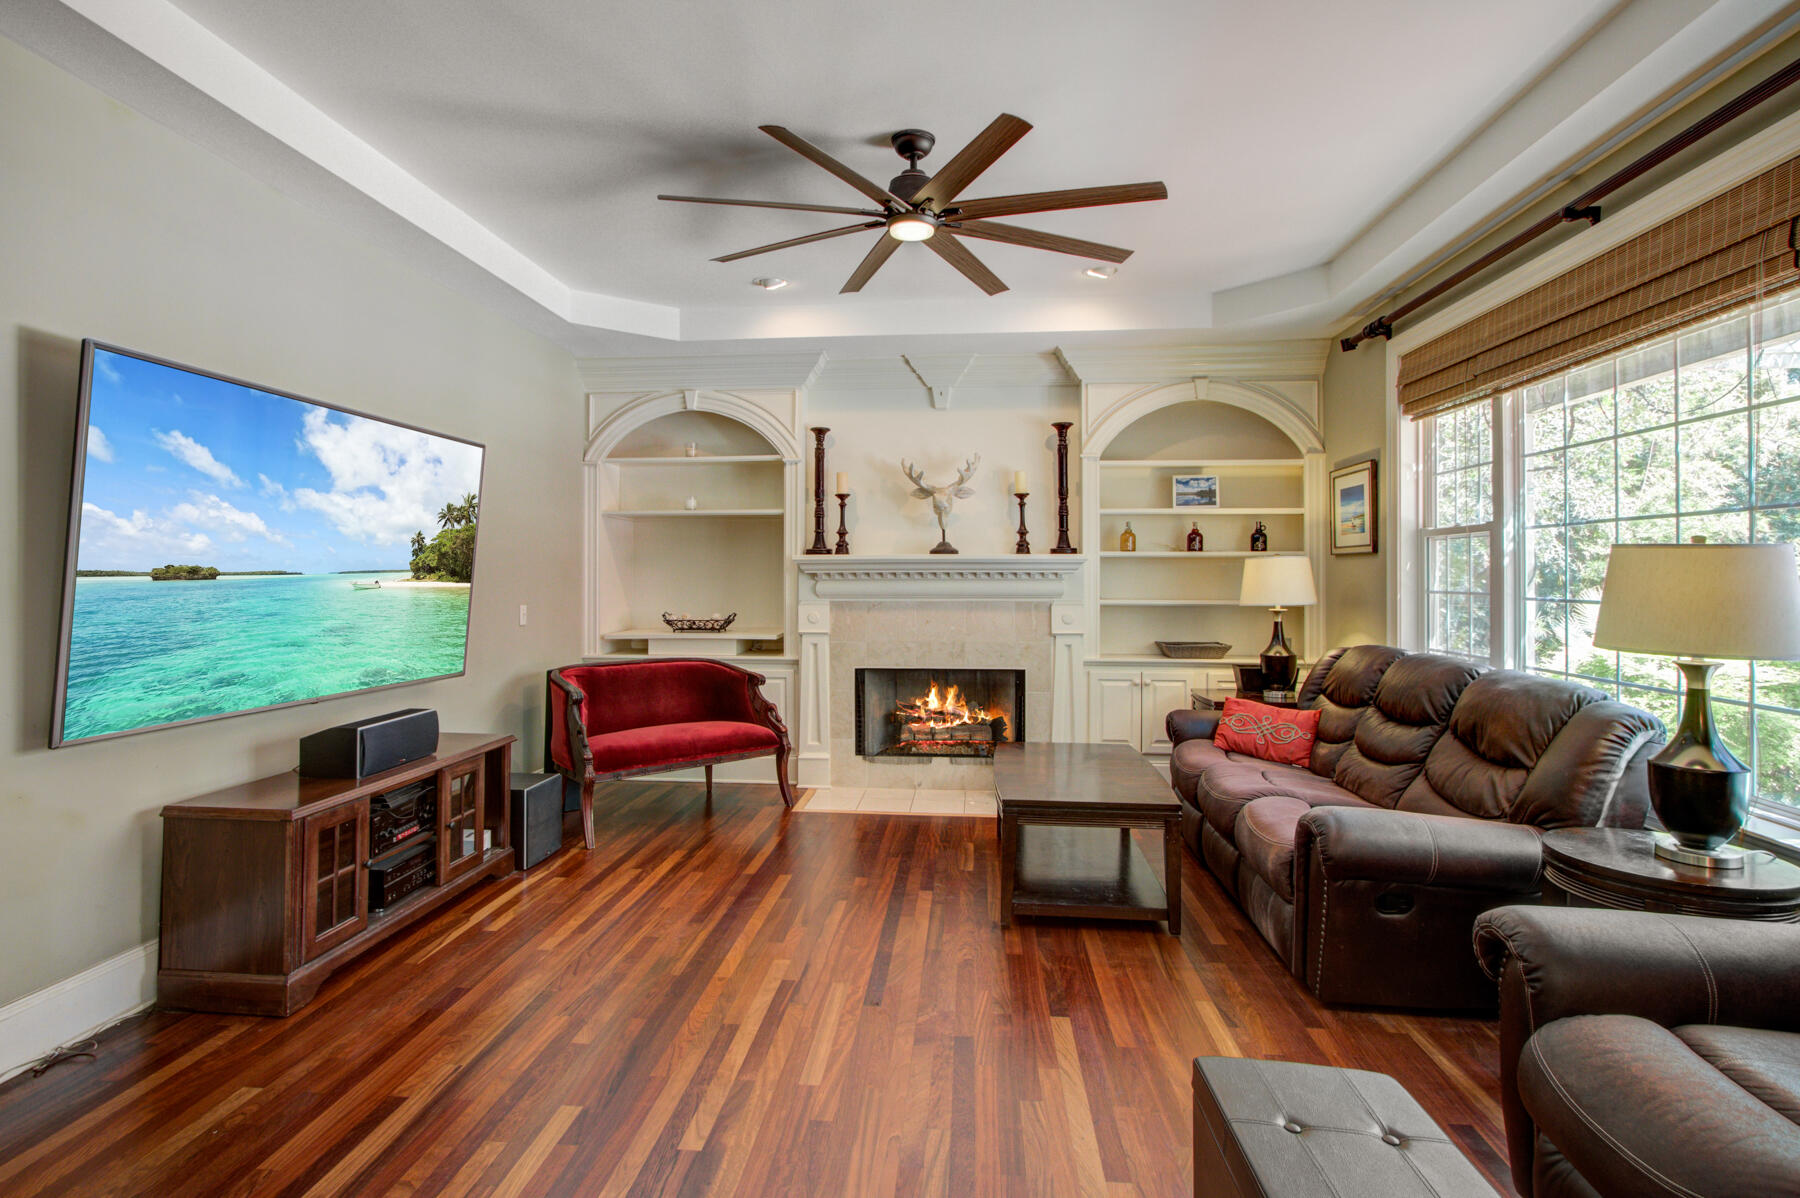 Dunes West Homes For Sale - 3095 Pignatelli, Mount Pleasant, SC - 17